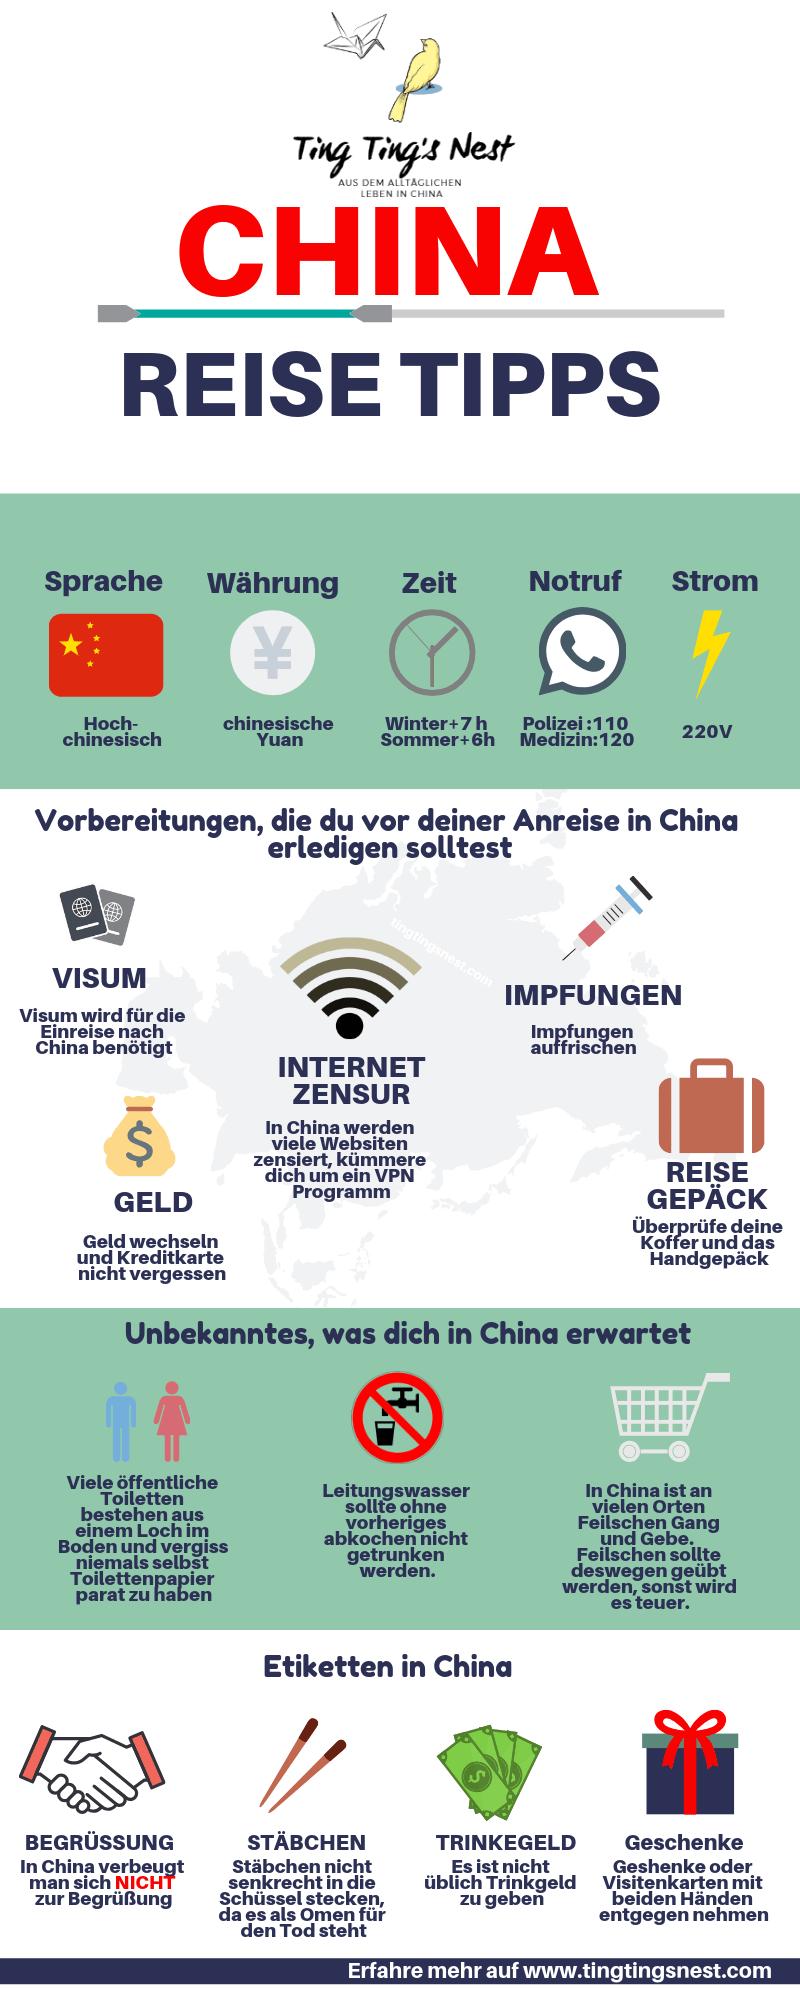 China Reiseblog — Ting Ting's Nest